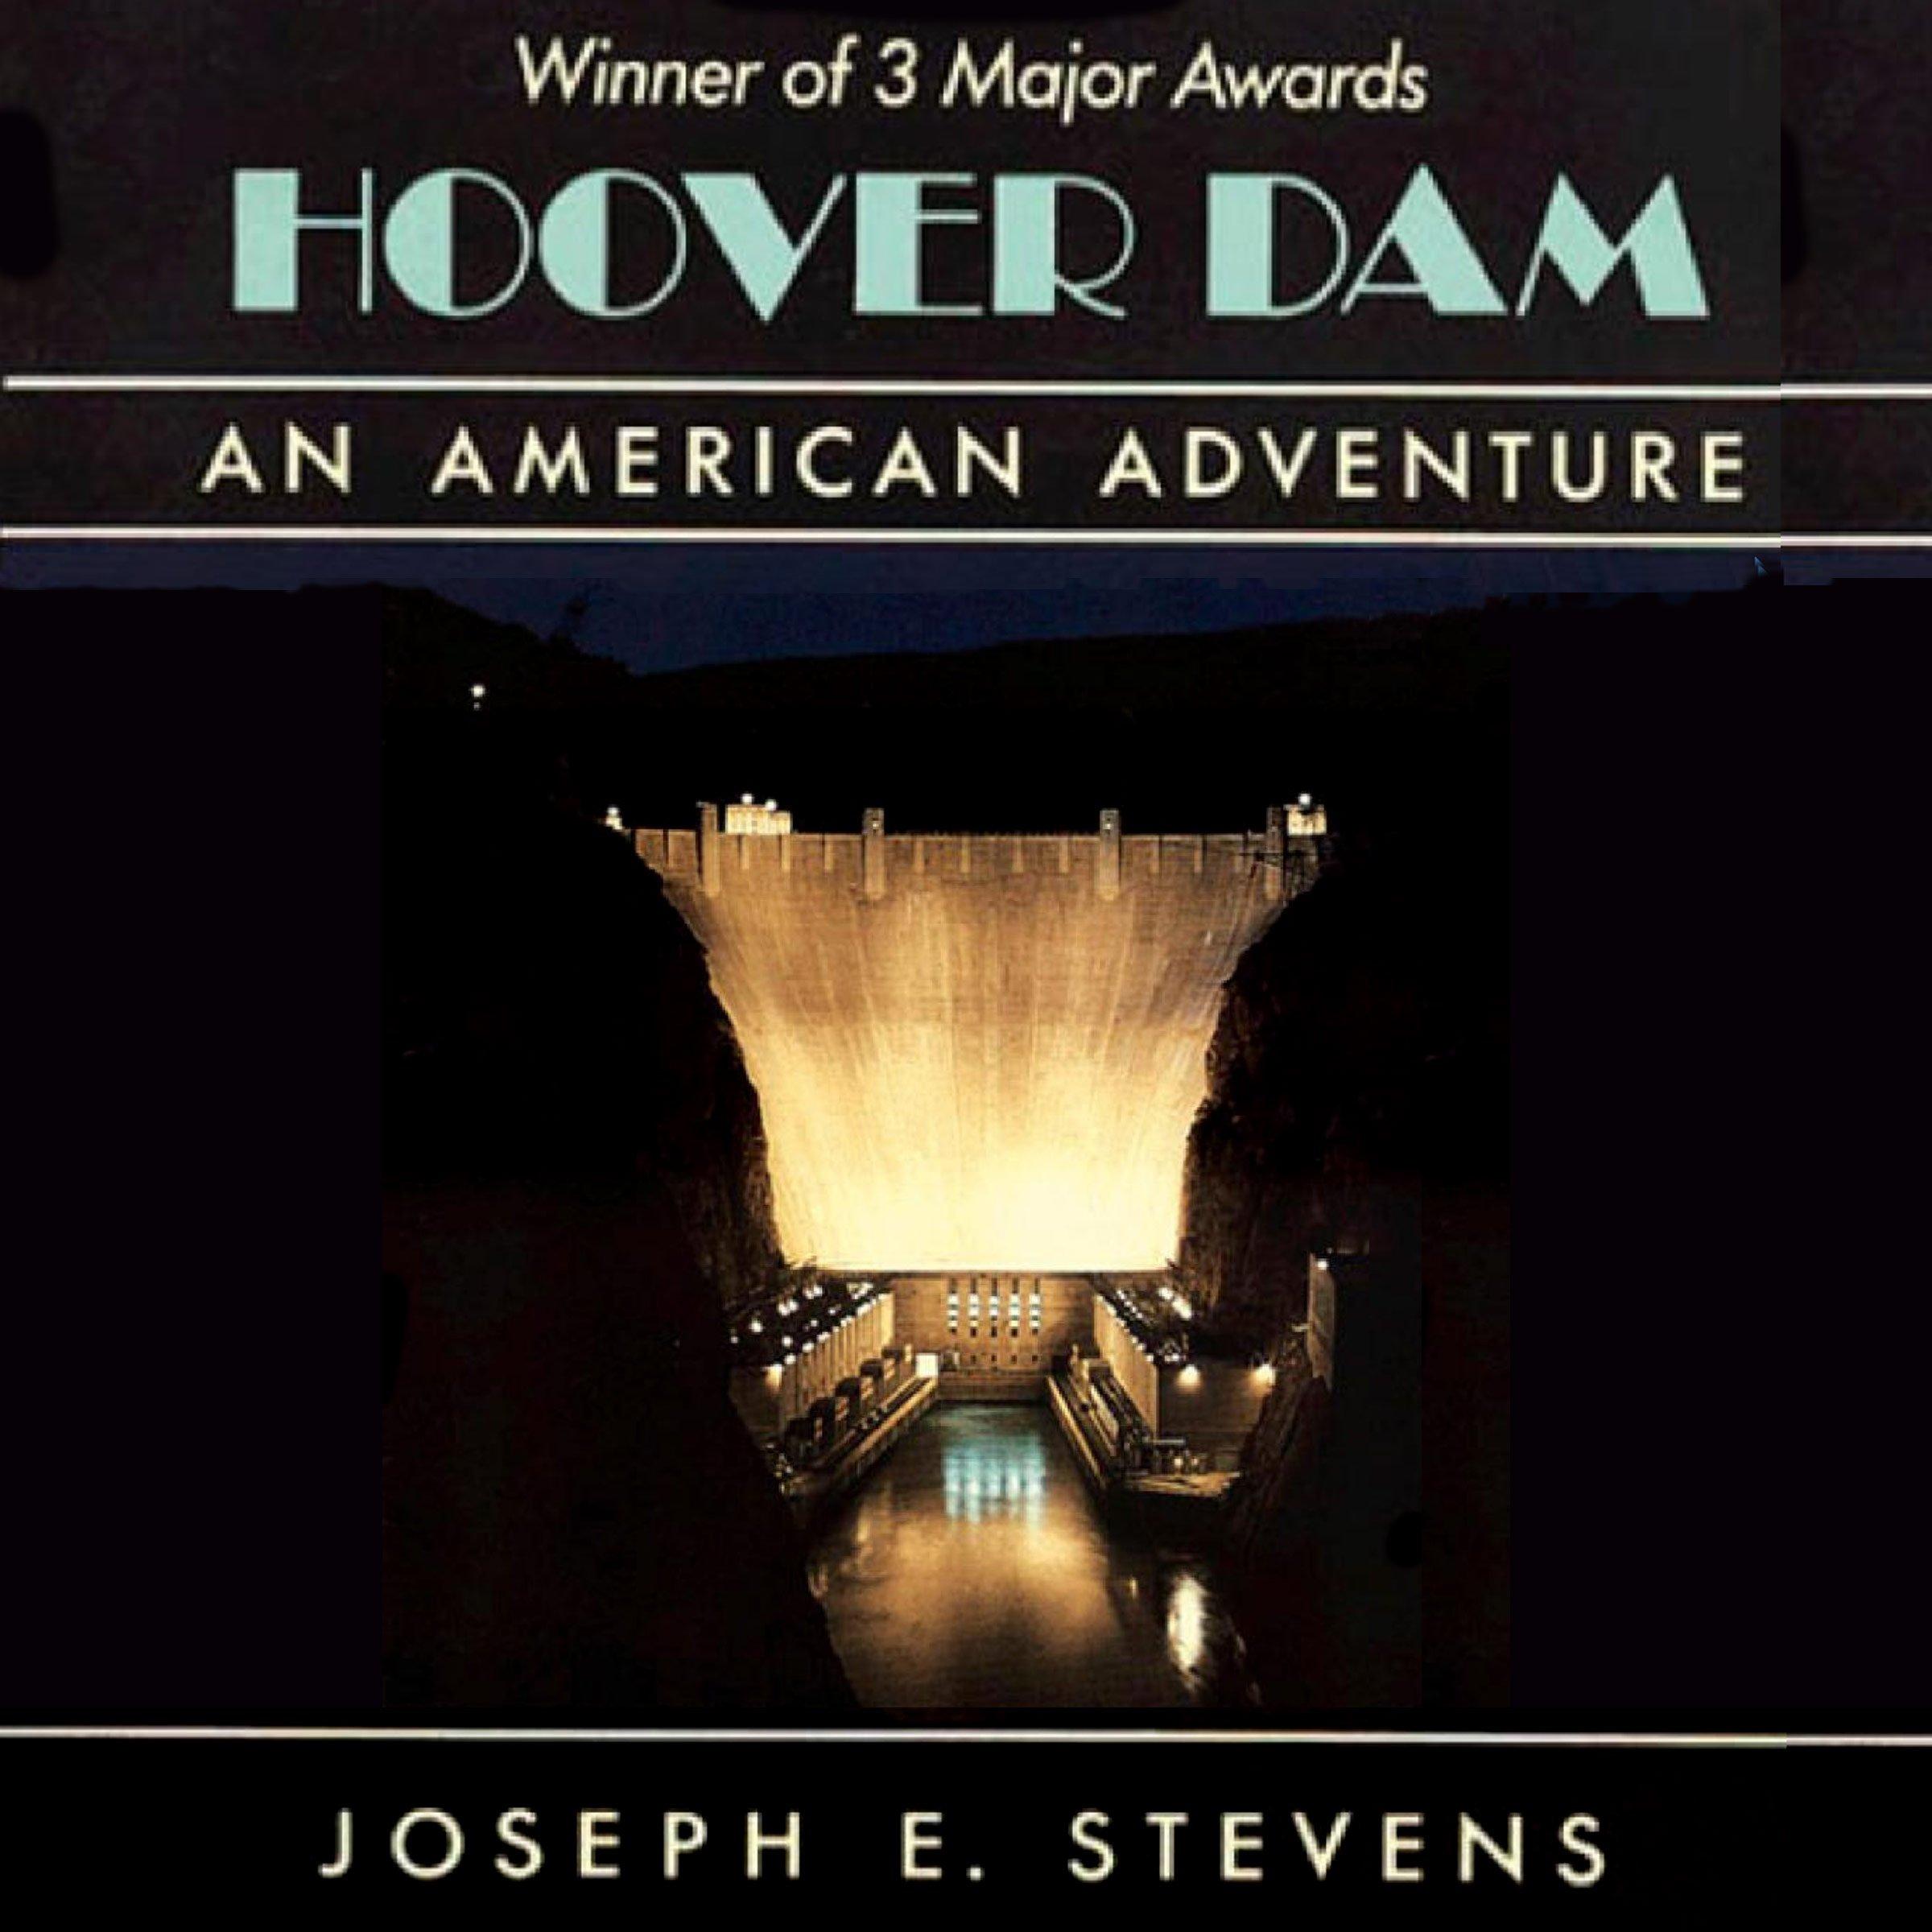 Hoover Dam: An American Adventure